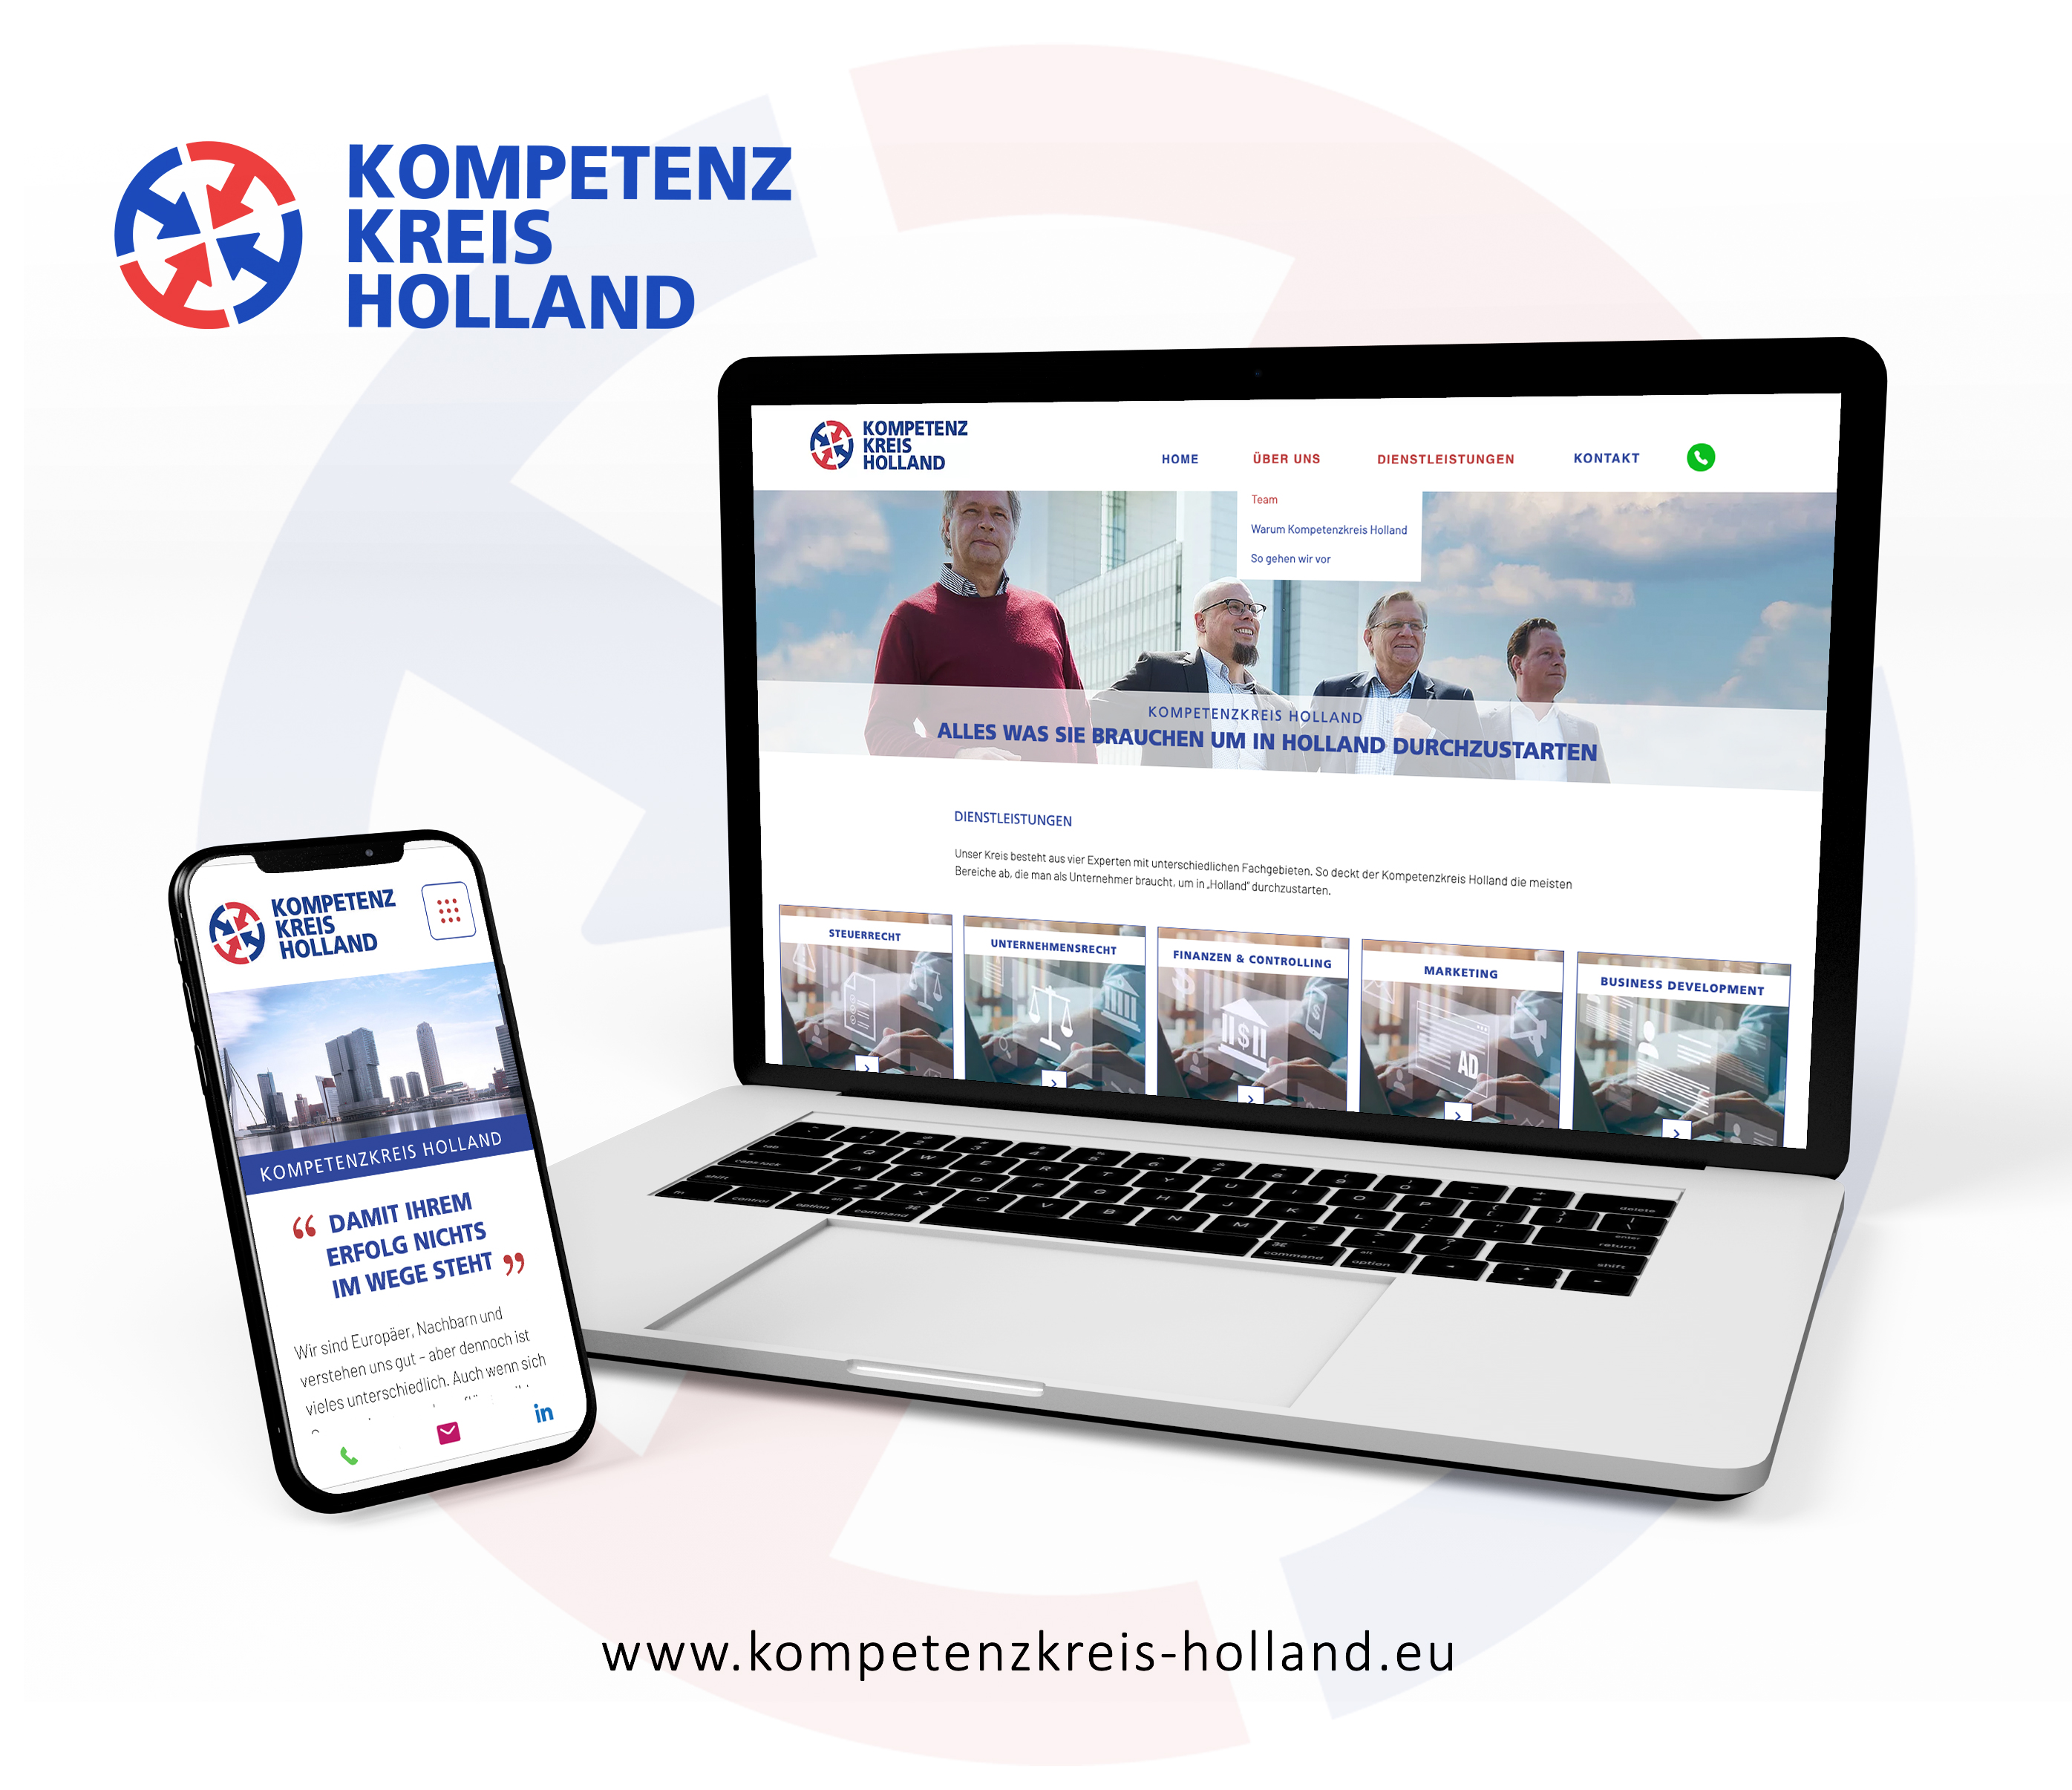 Kompetenzkreis Holland Kickstarter 2 package: https://www.houseofcommunic...